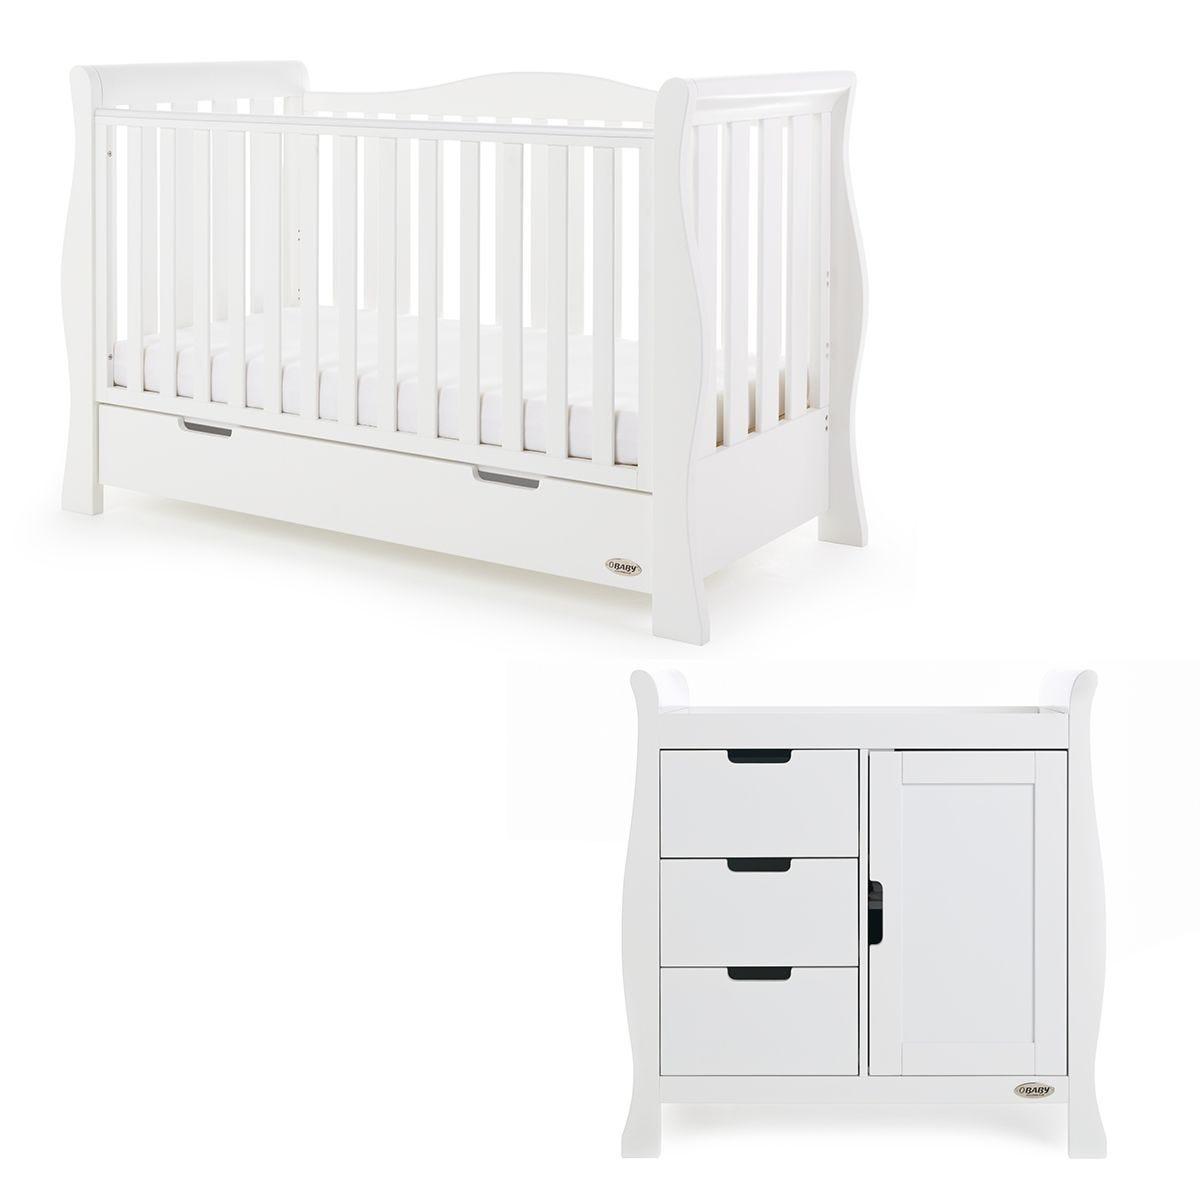 Obaby Stamford Luxe Sleigh 2 Piece Room Set White